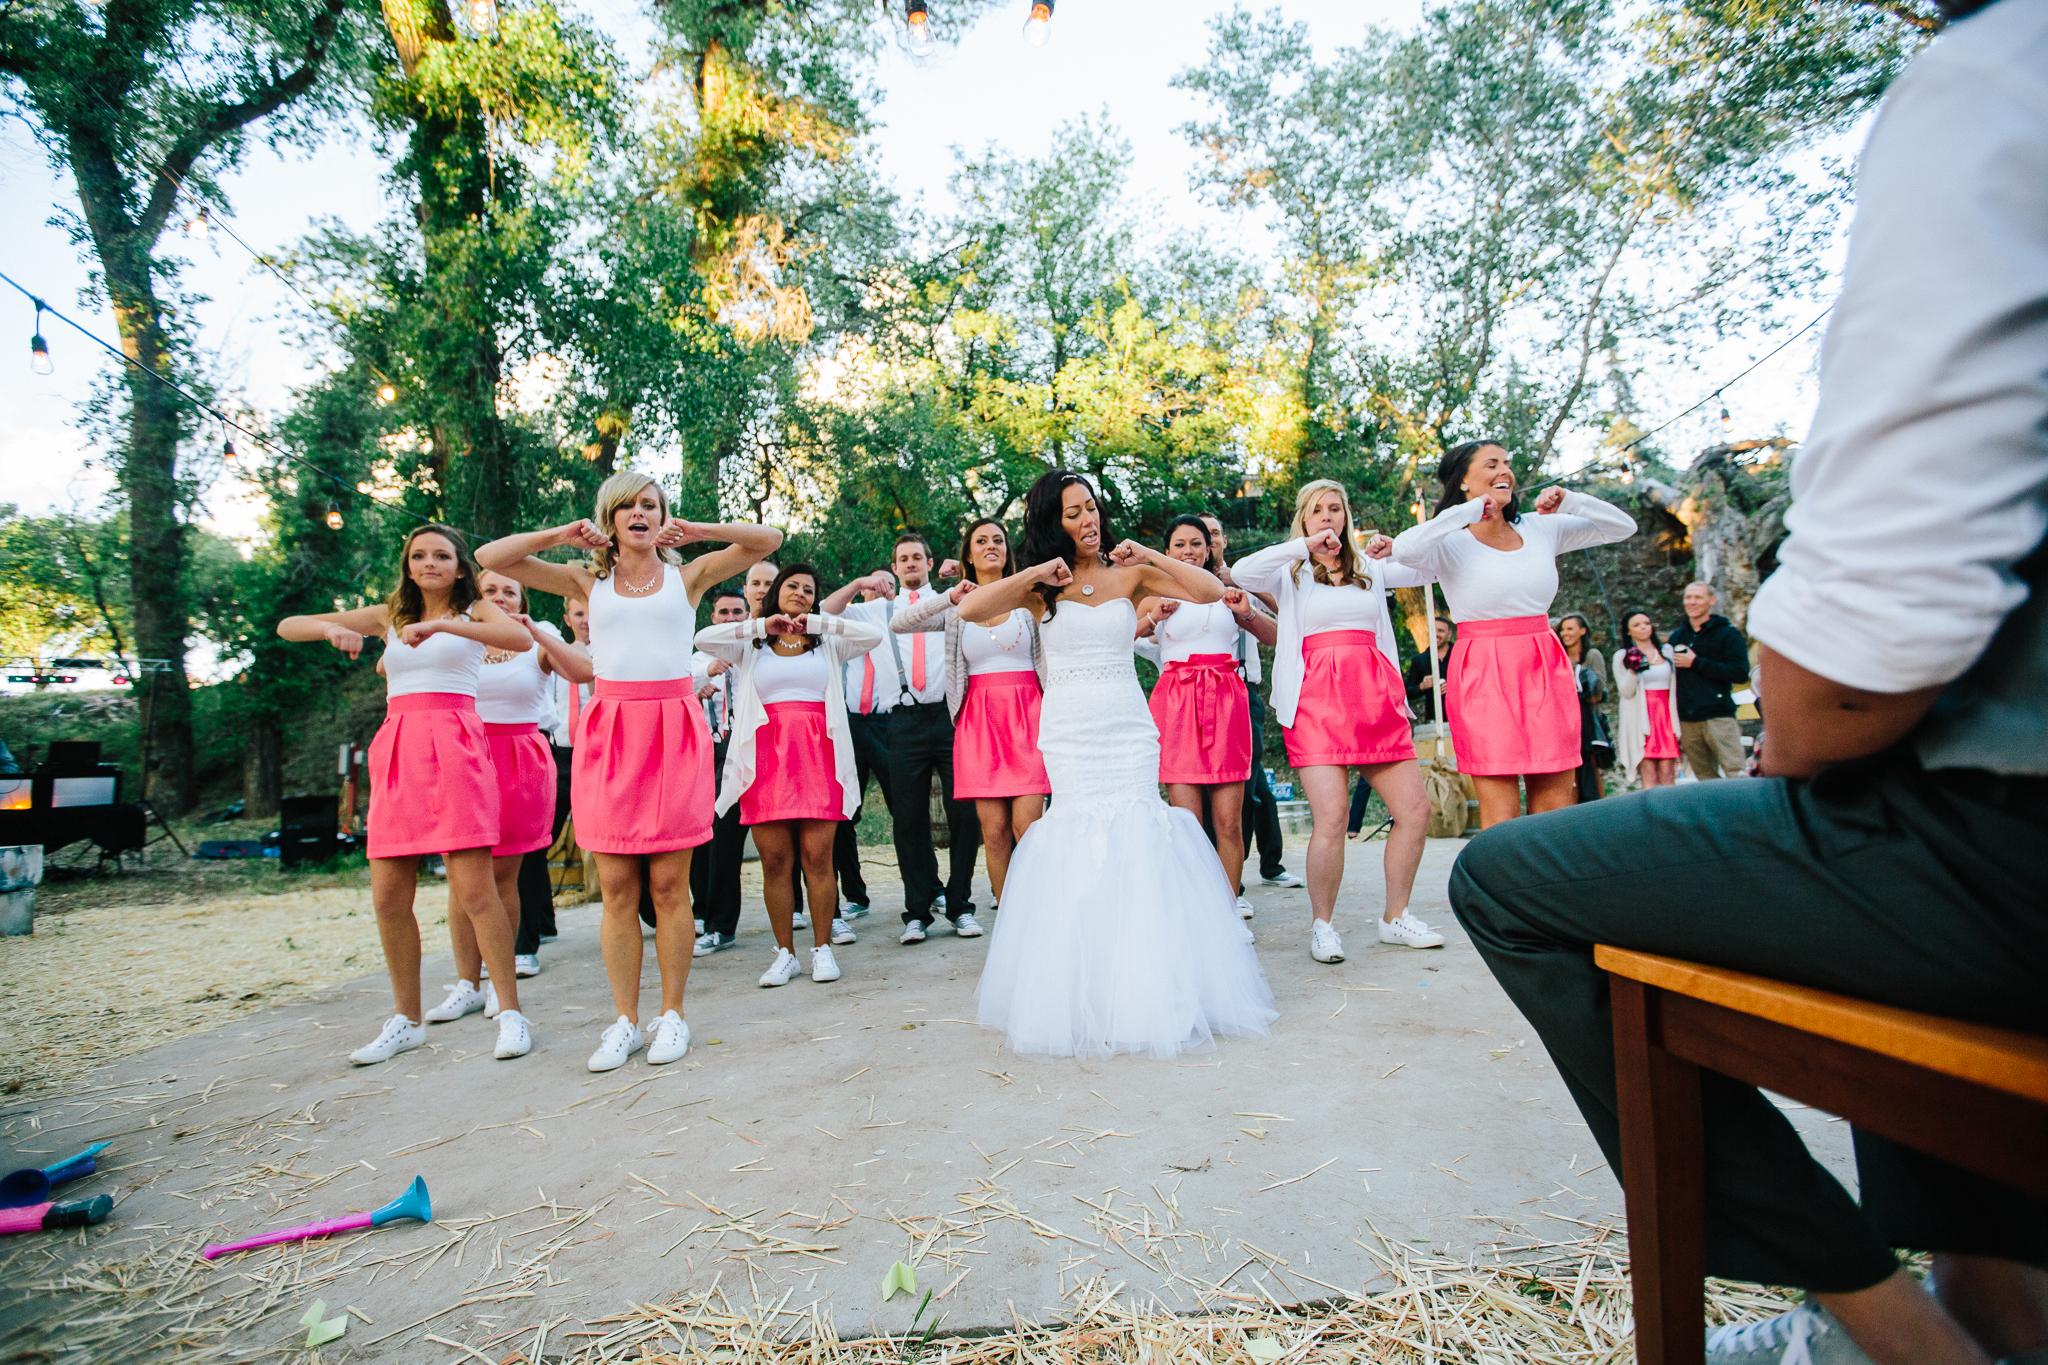 Prescott-Wedding-Photographer-3190.jpg